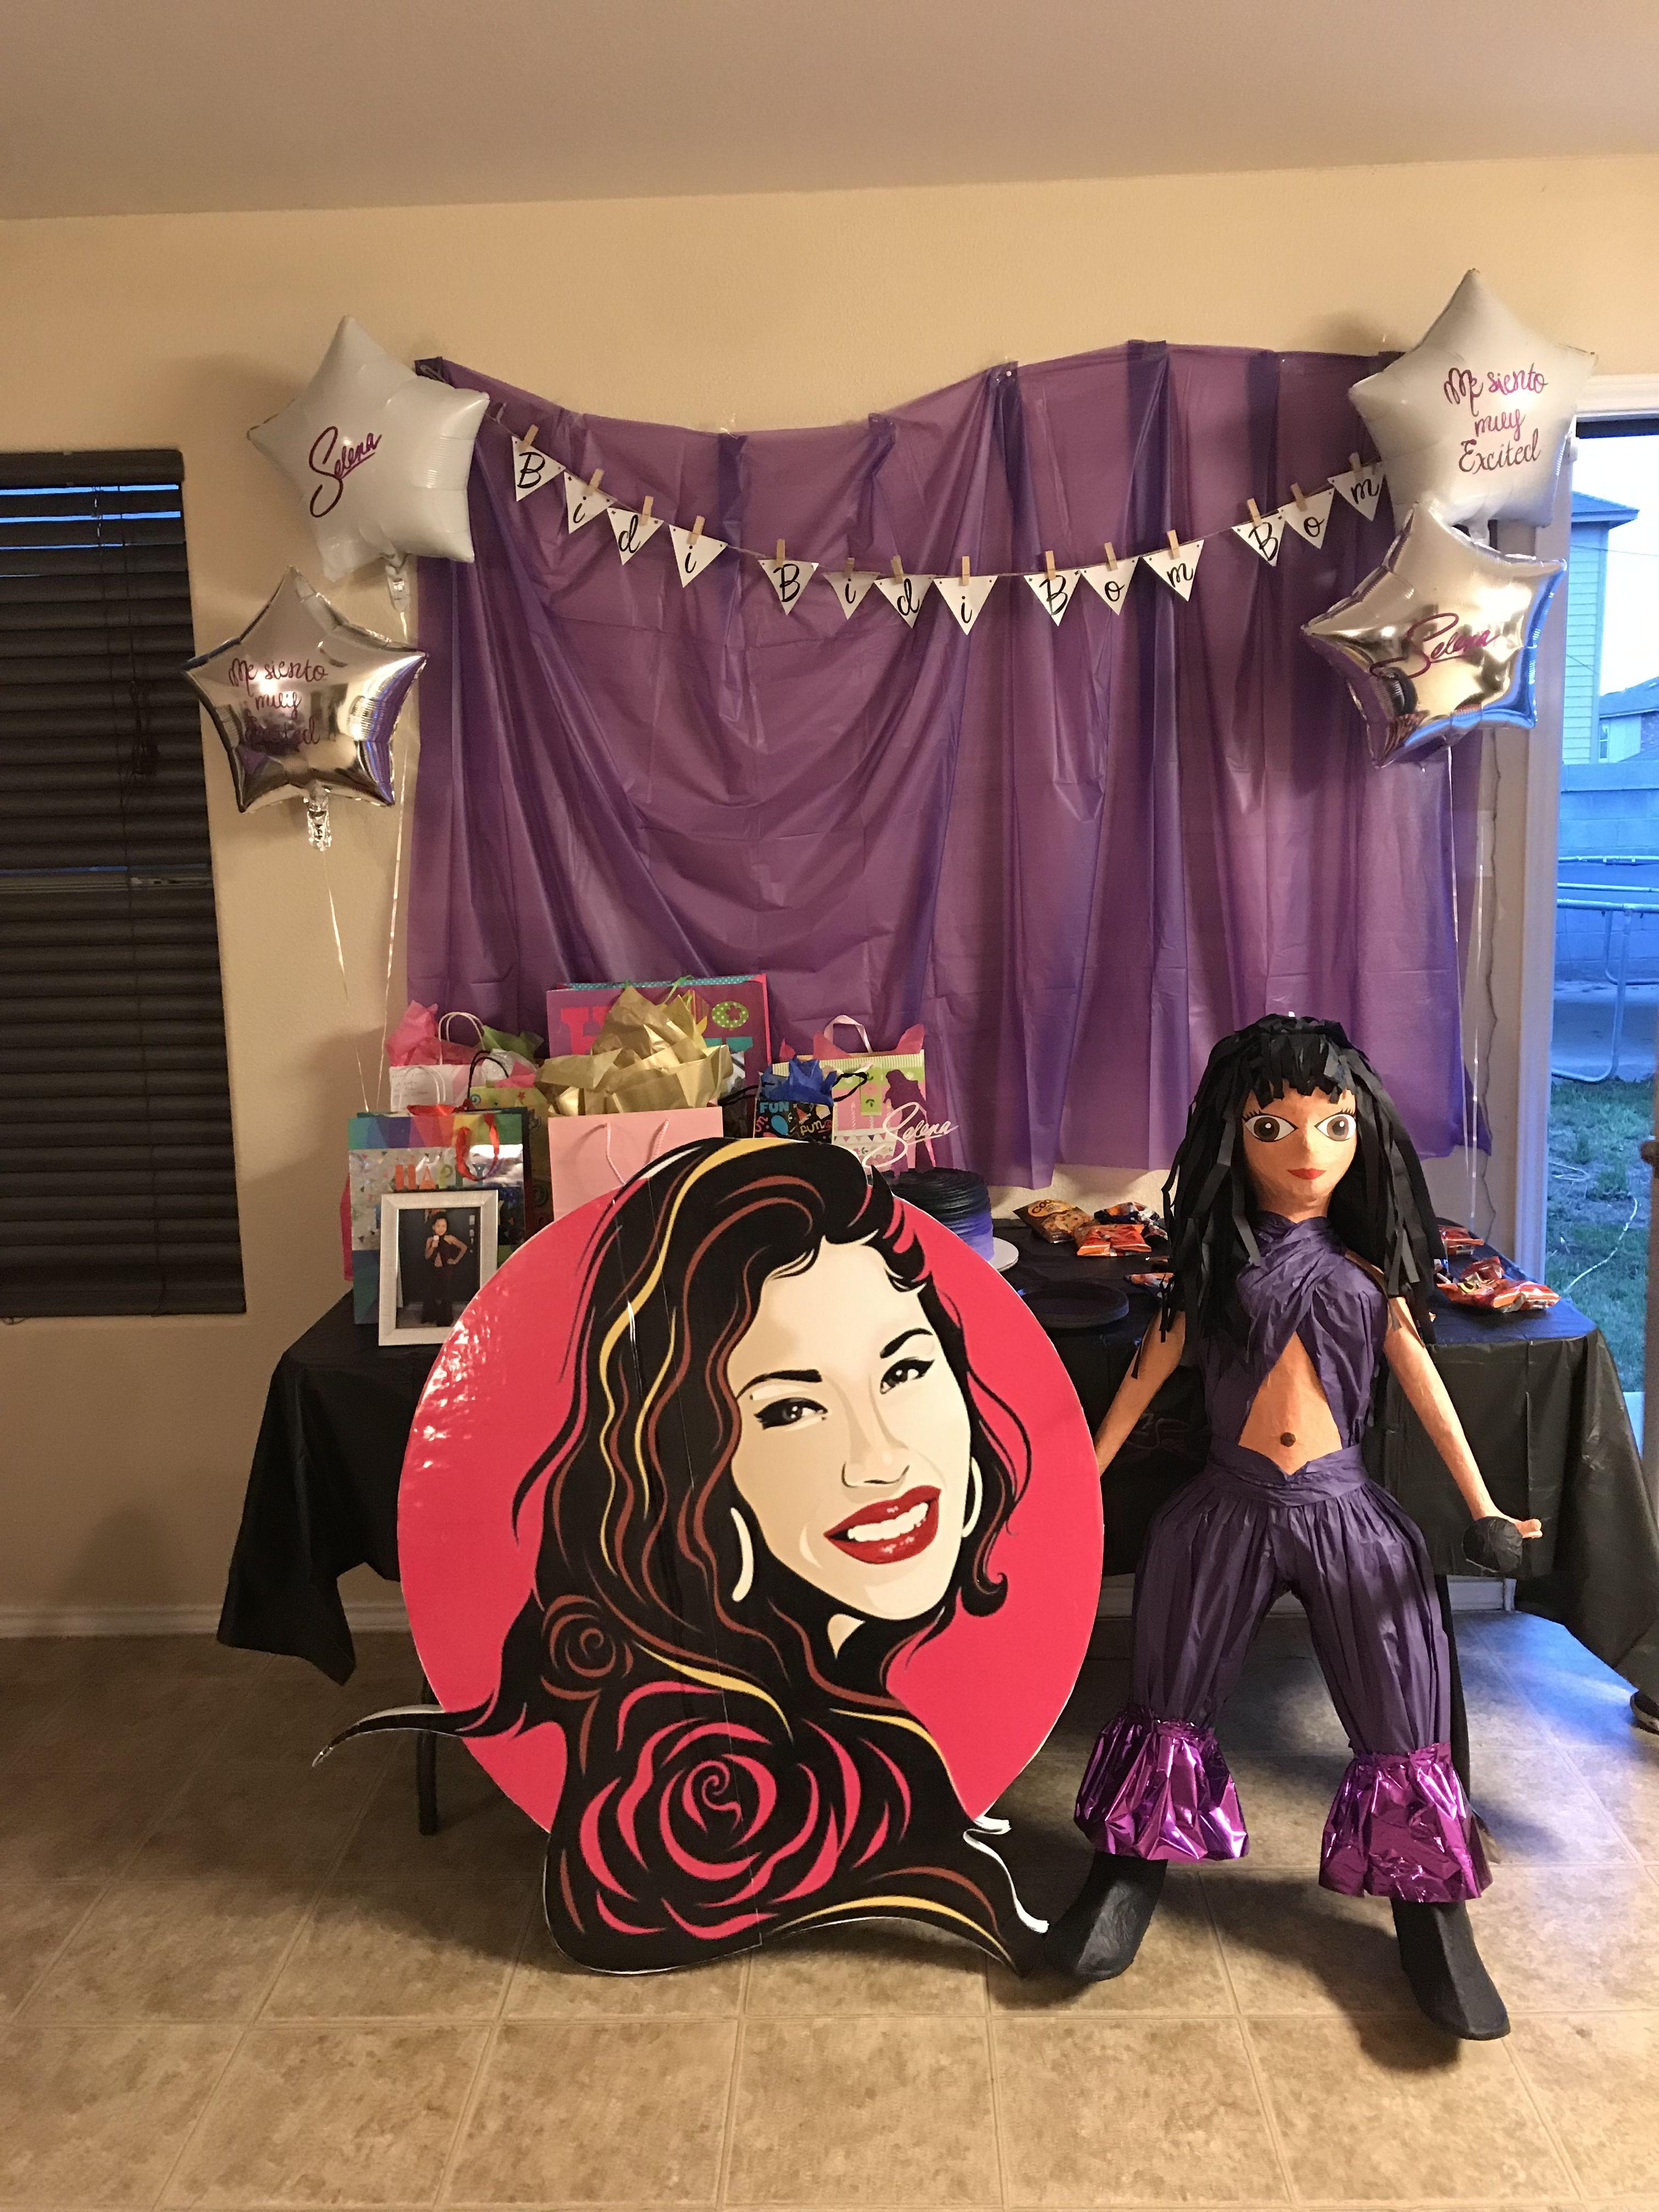 Pin by QwEEN Kash on Everything Selena QuintanillaPérez